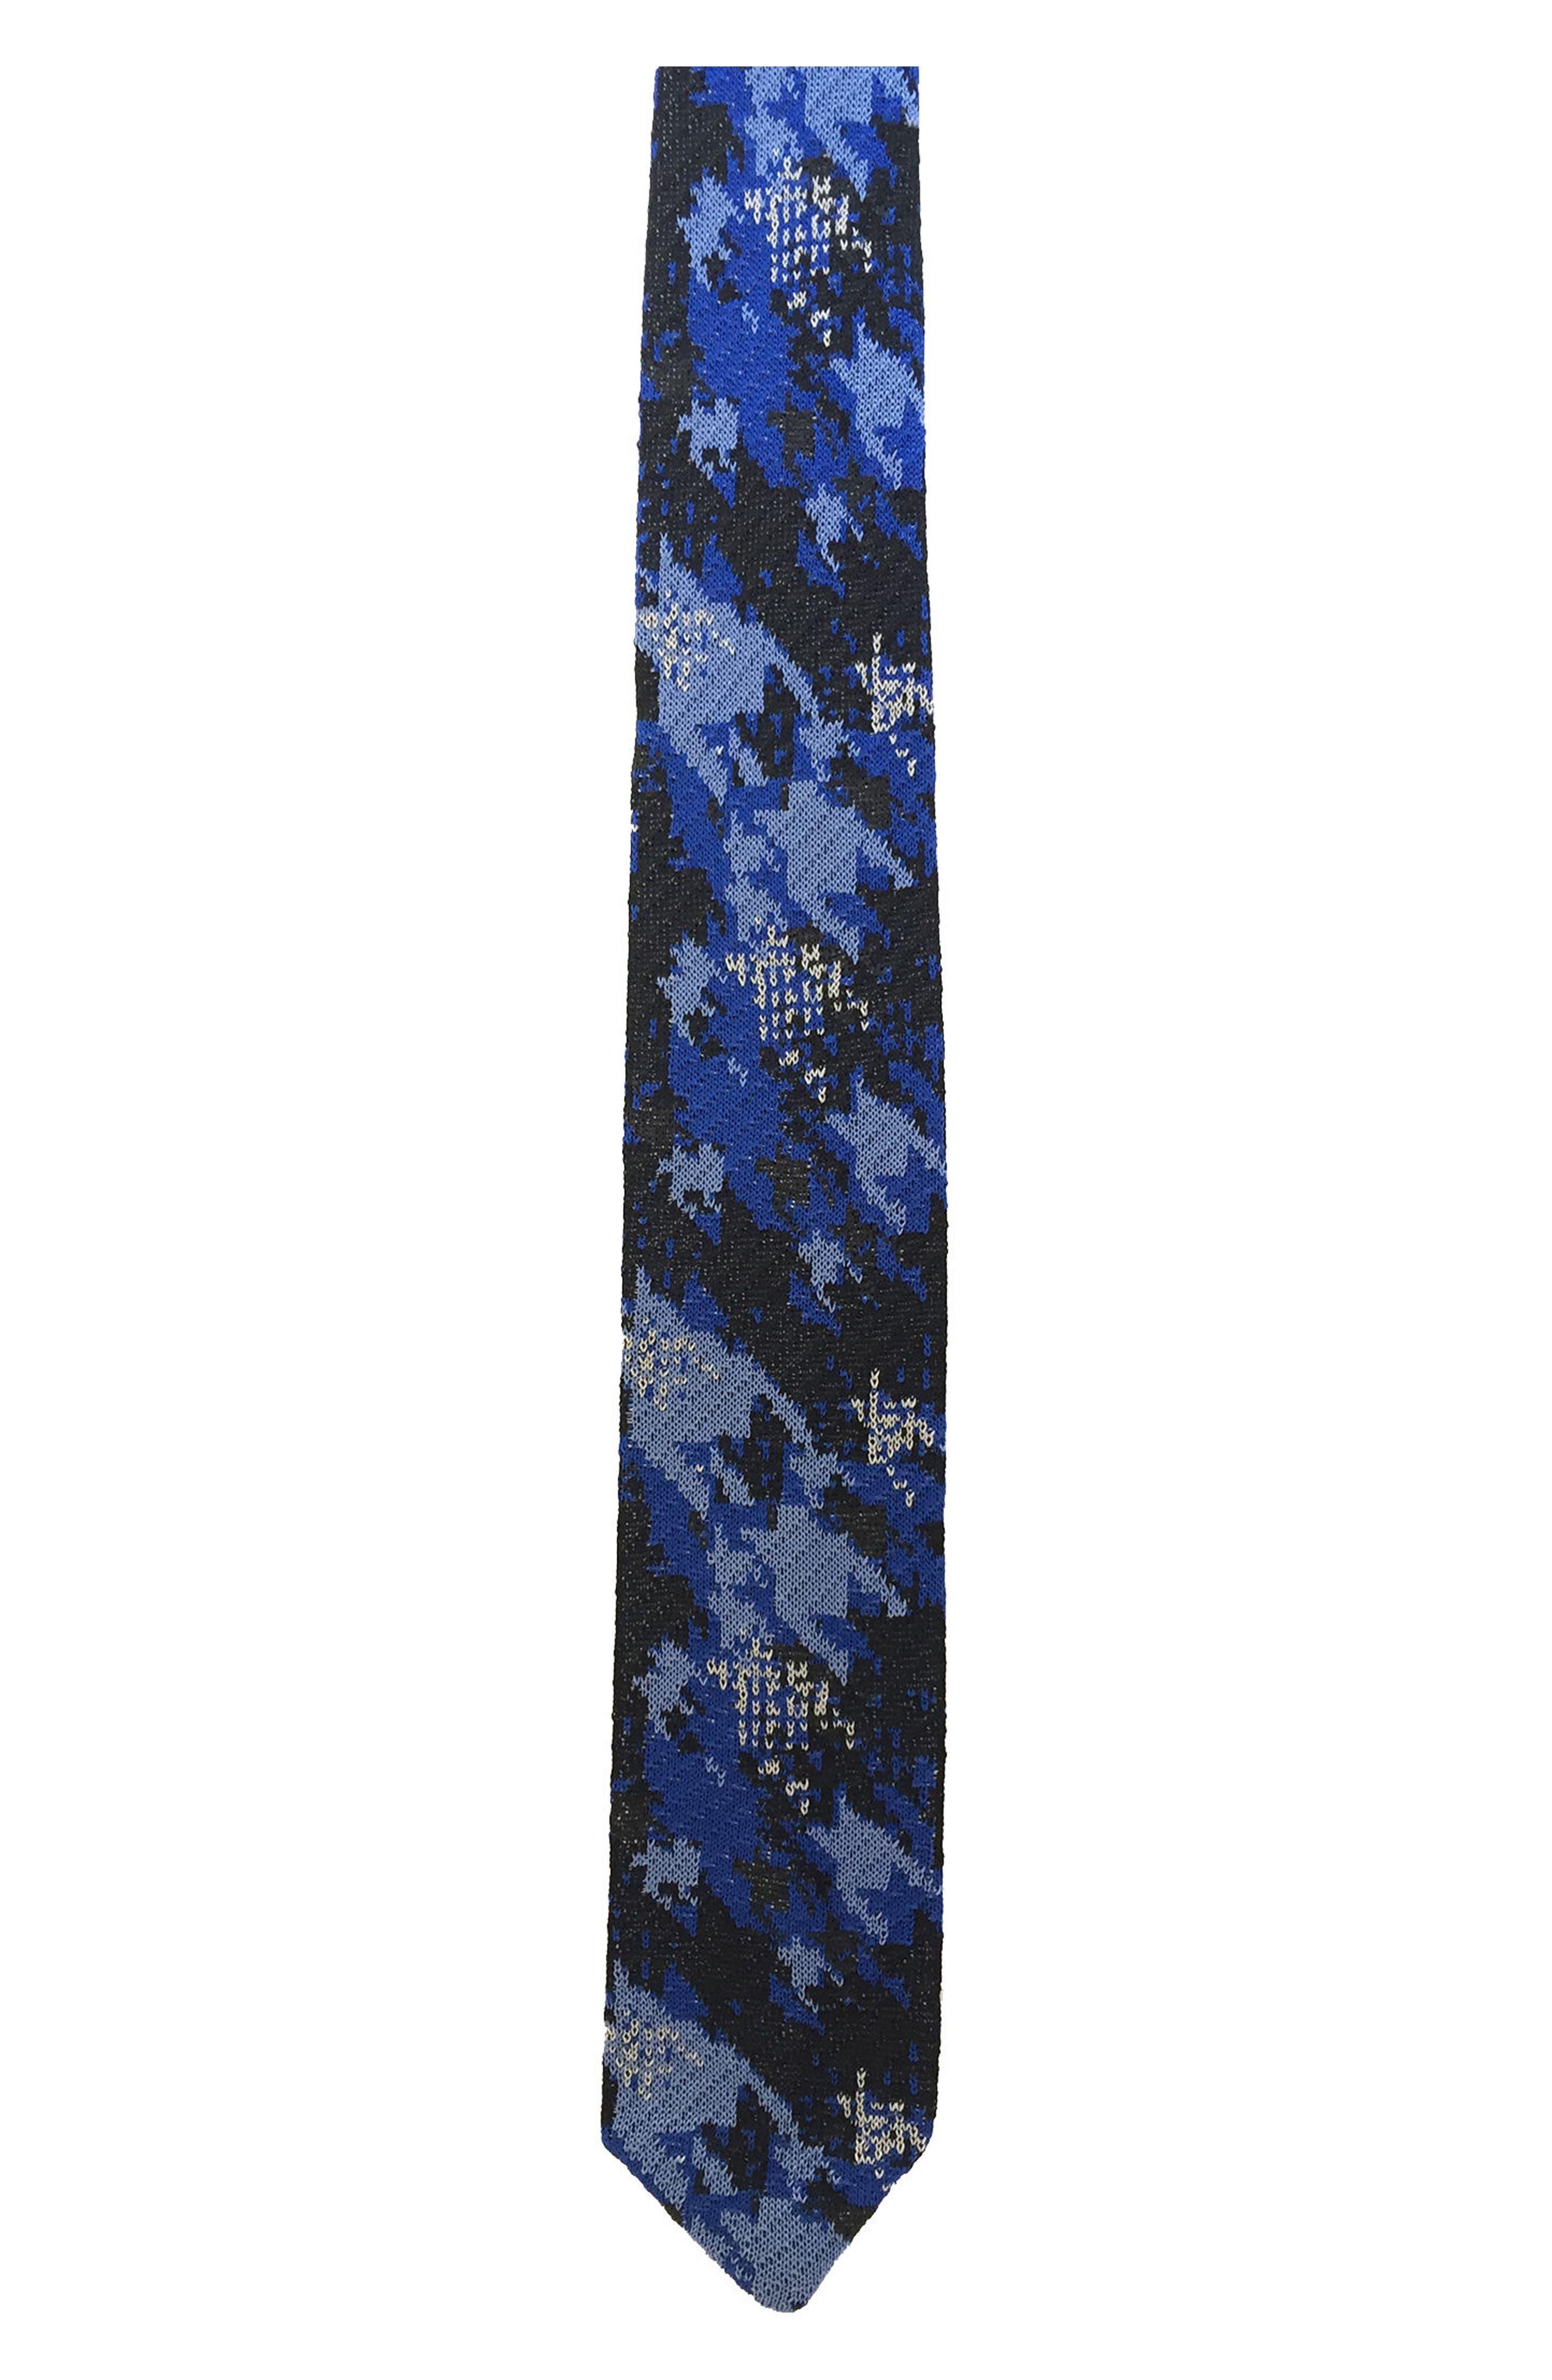 hook + ALBERT Knit Silk Tie